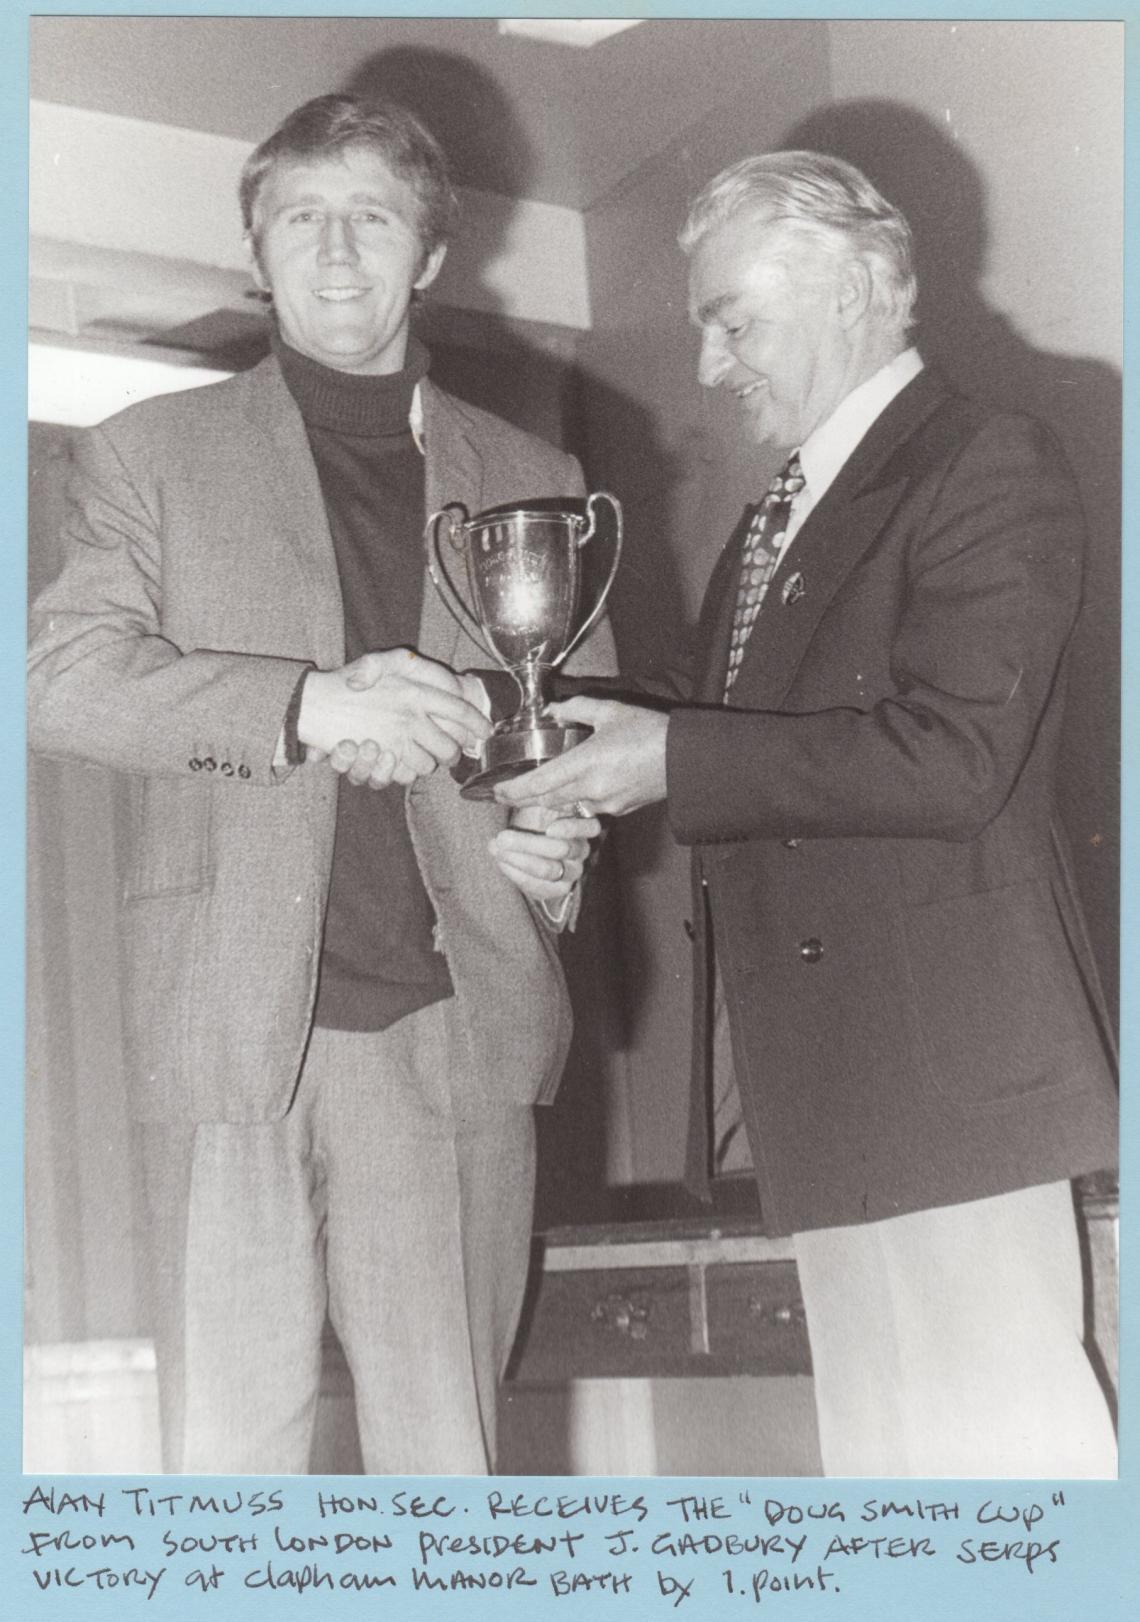 1977, SSC Hon. Sec. receives the cup from SLSC president J Gadbury